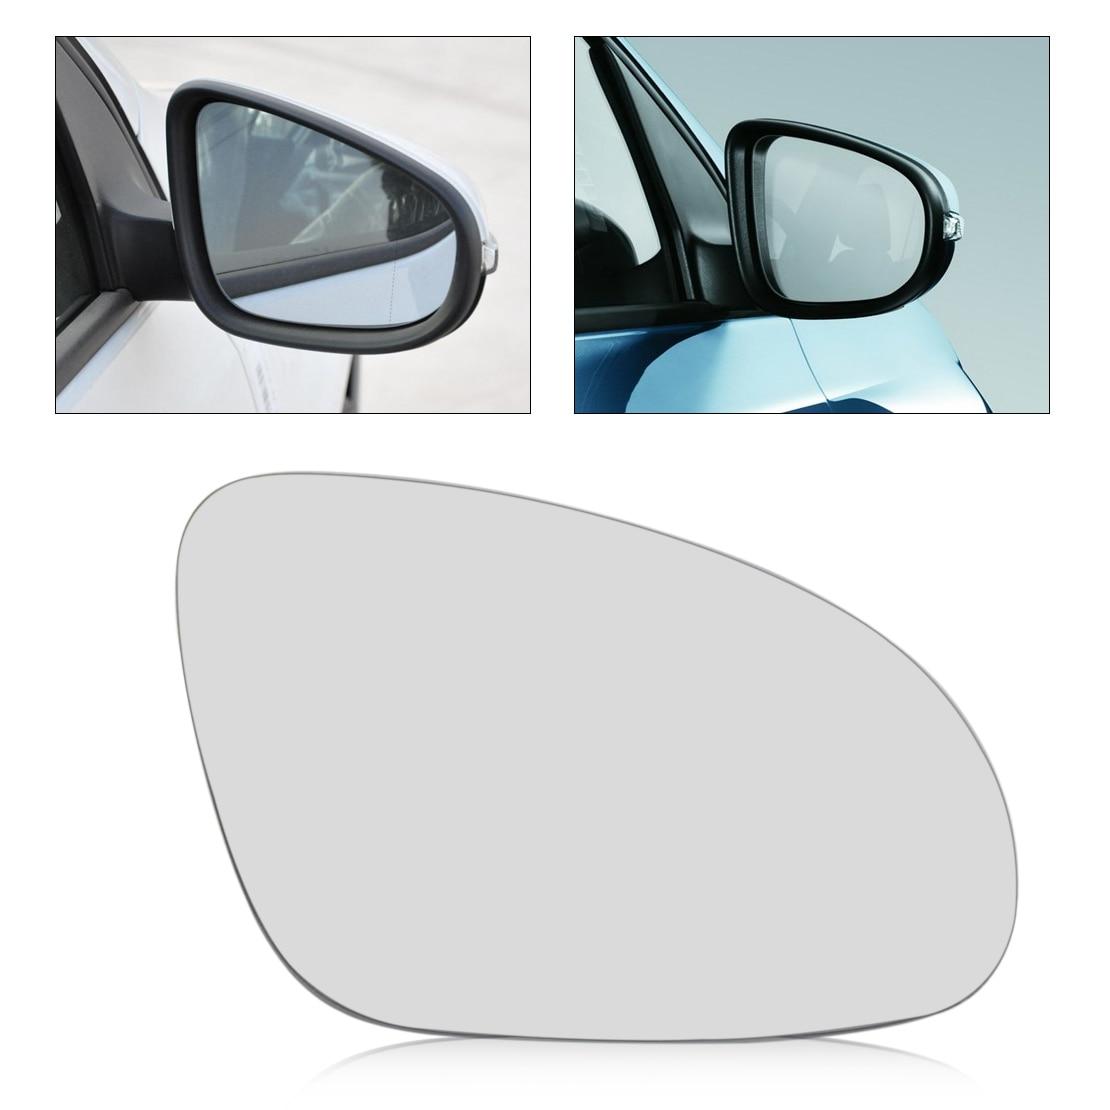 beler Car Right Side Wing Mirror Glass Heat W/ Holder for Volkswagen VW Golf GTI Jetta MK5 EOS R32 Rabbit Passat B6